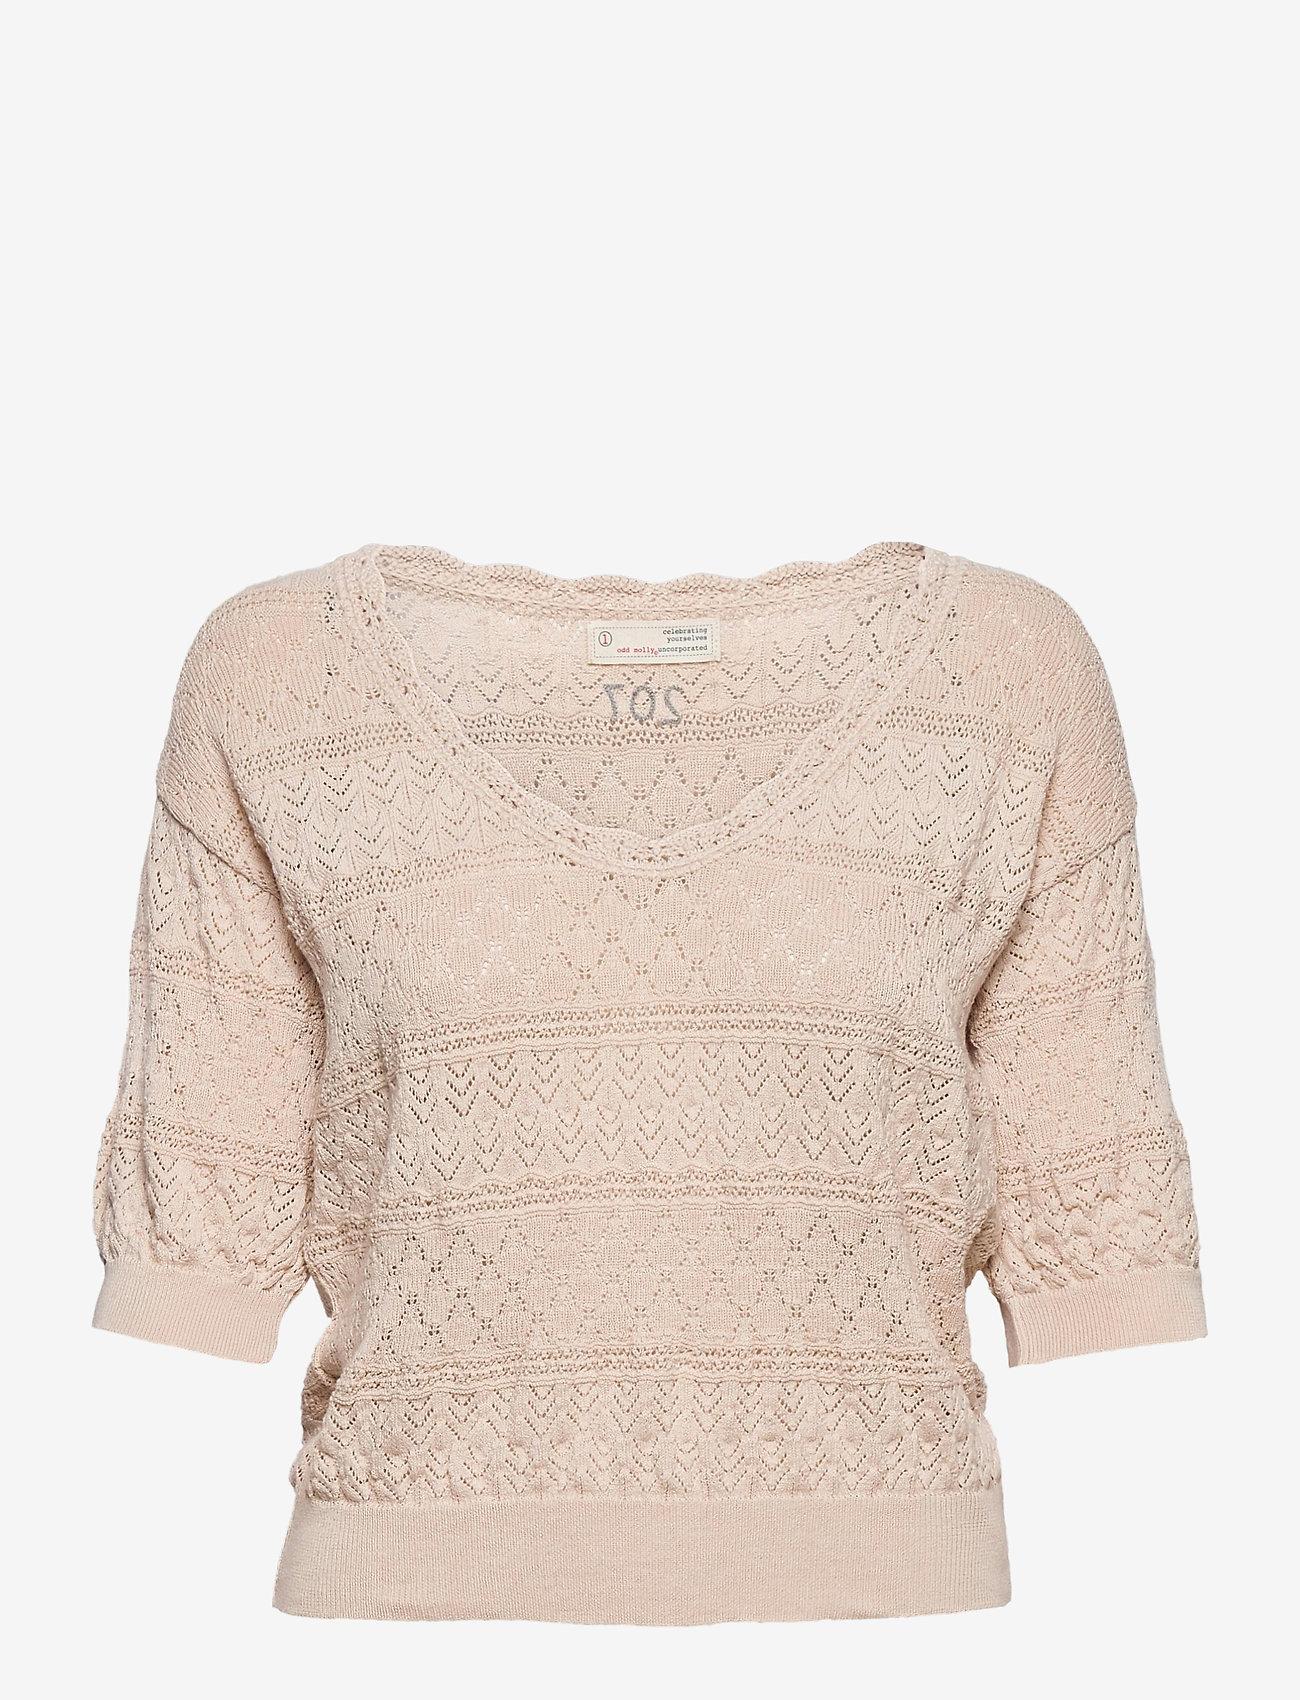 ODD MOLLY - Lucky Charm Sweater - hauts tricotés - light porcelain - 0